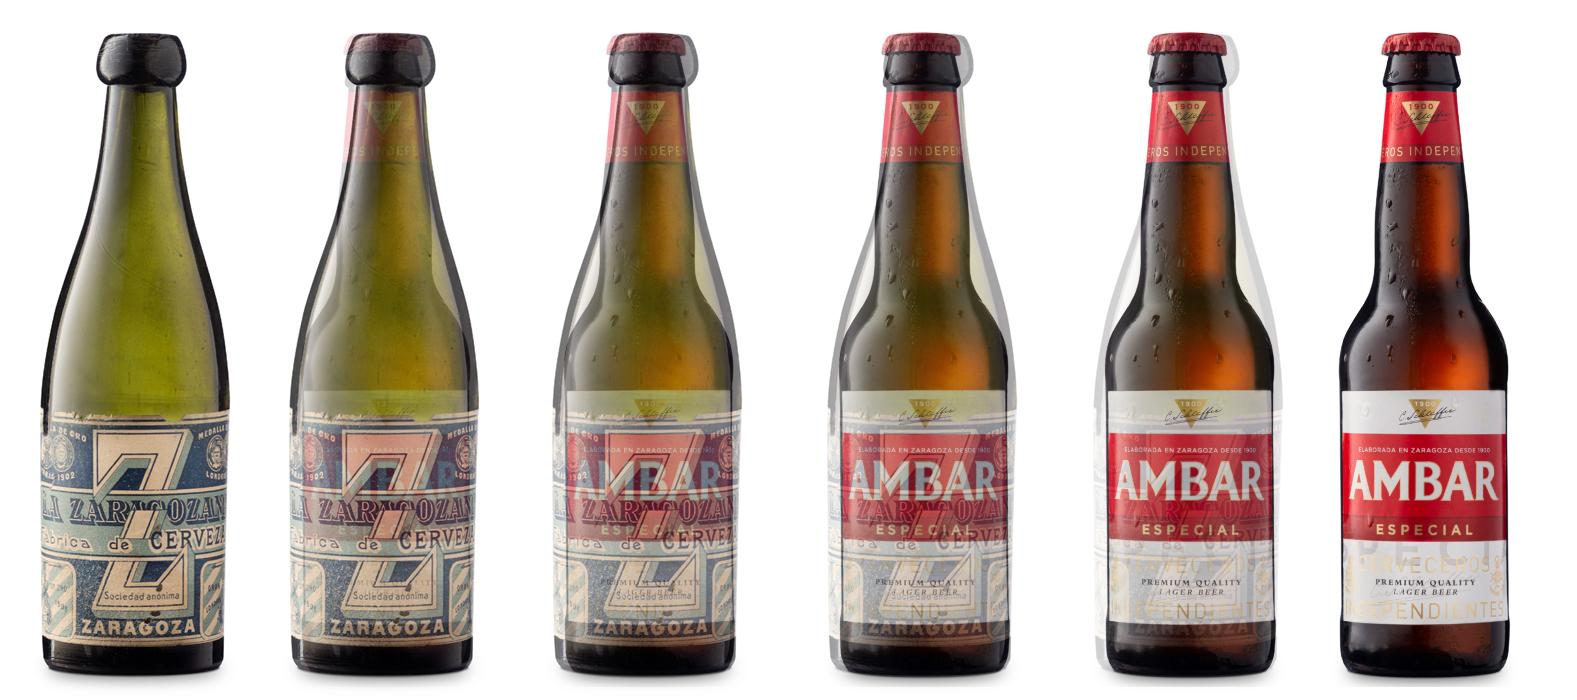 Botellas Ambar 1898-2020